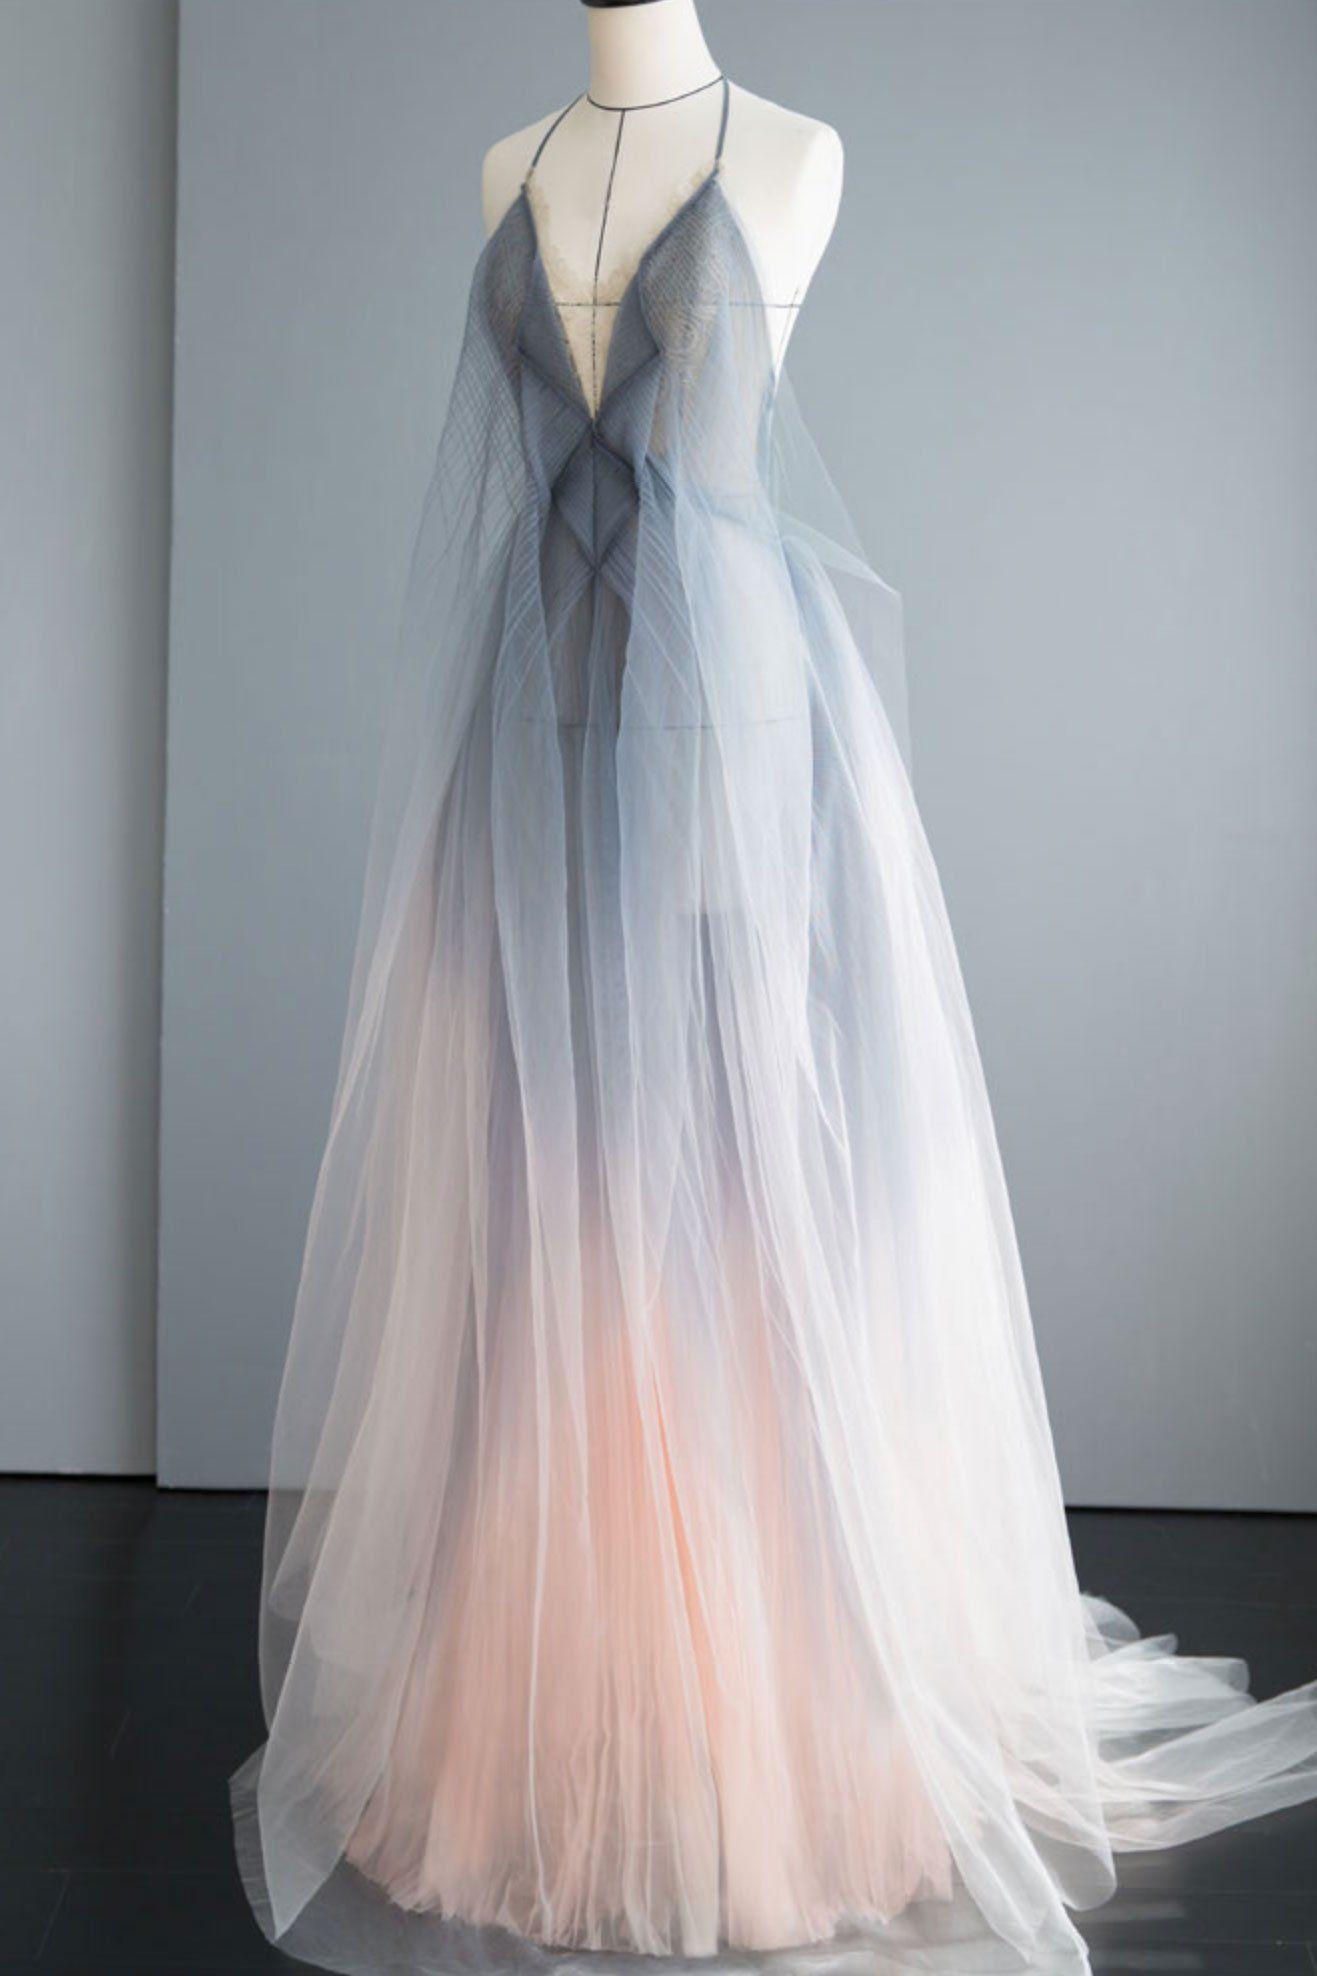 Gray Tulle Long Prom Dress Gray Tulle Formal Dress Prom Dresses Sleeveless Halter Prom Dresses A Line Prom Dresses